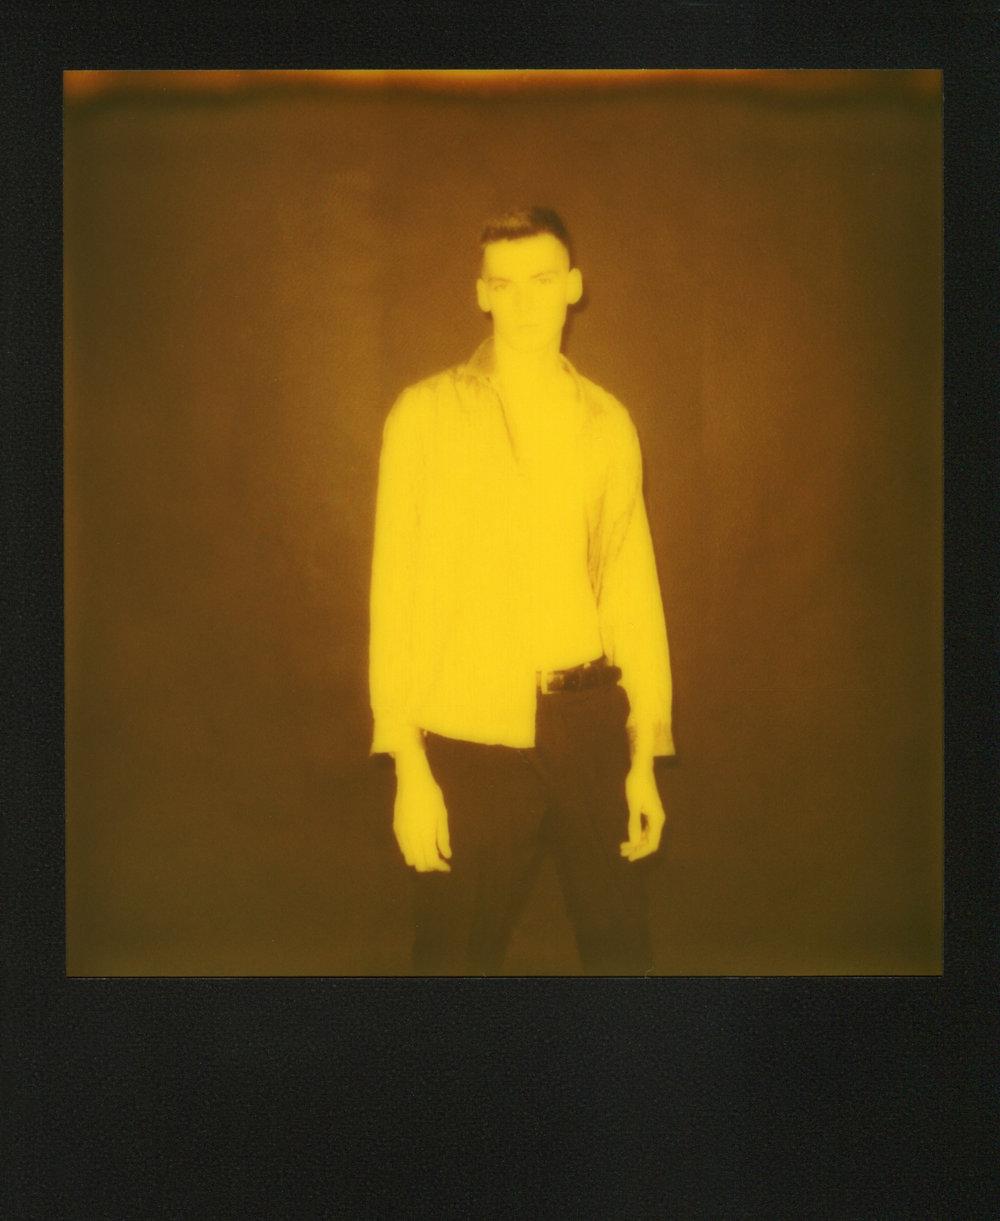 Nathaniel-Yellow-Polaroid-casenruiz.jpg